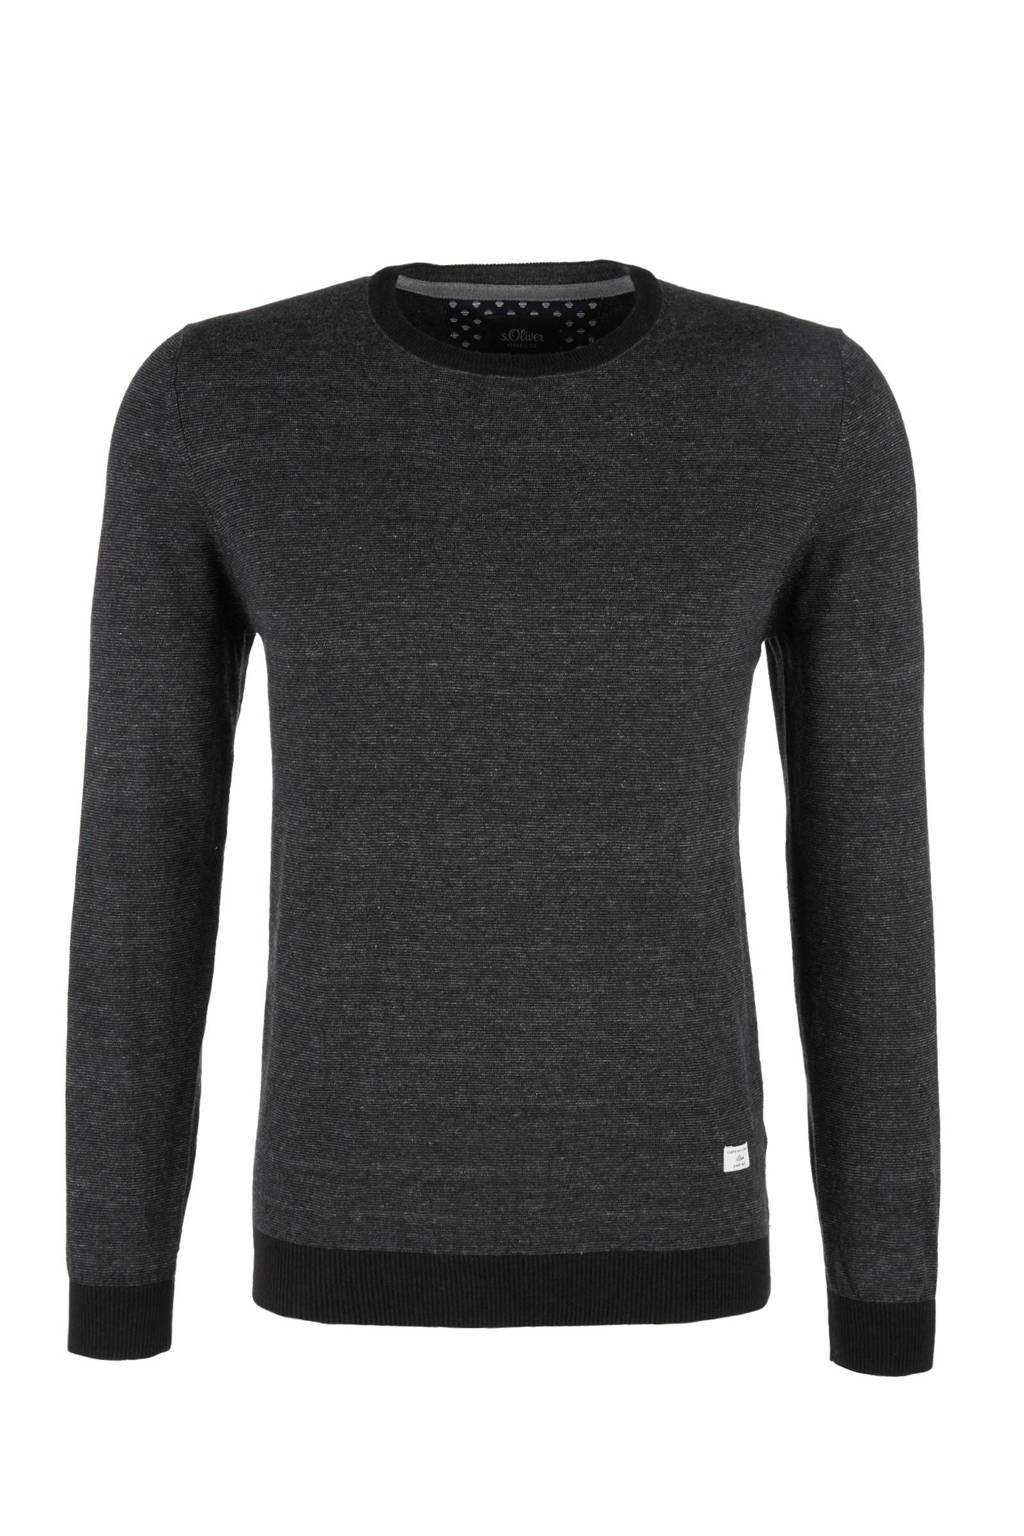 s.Oliver sweater, Antraciet